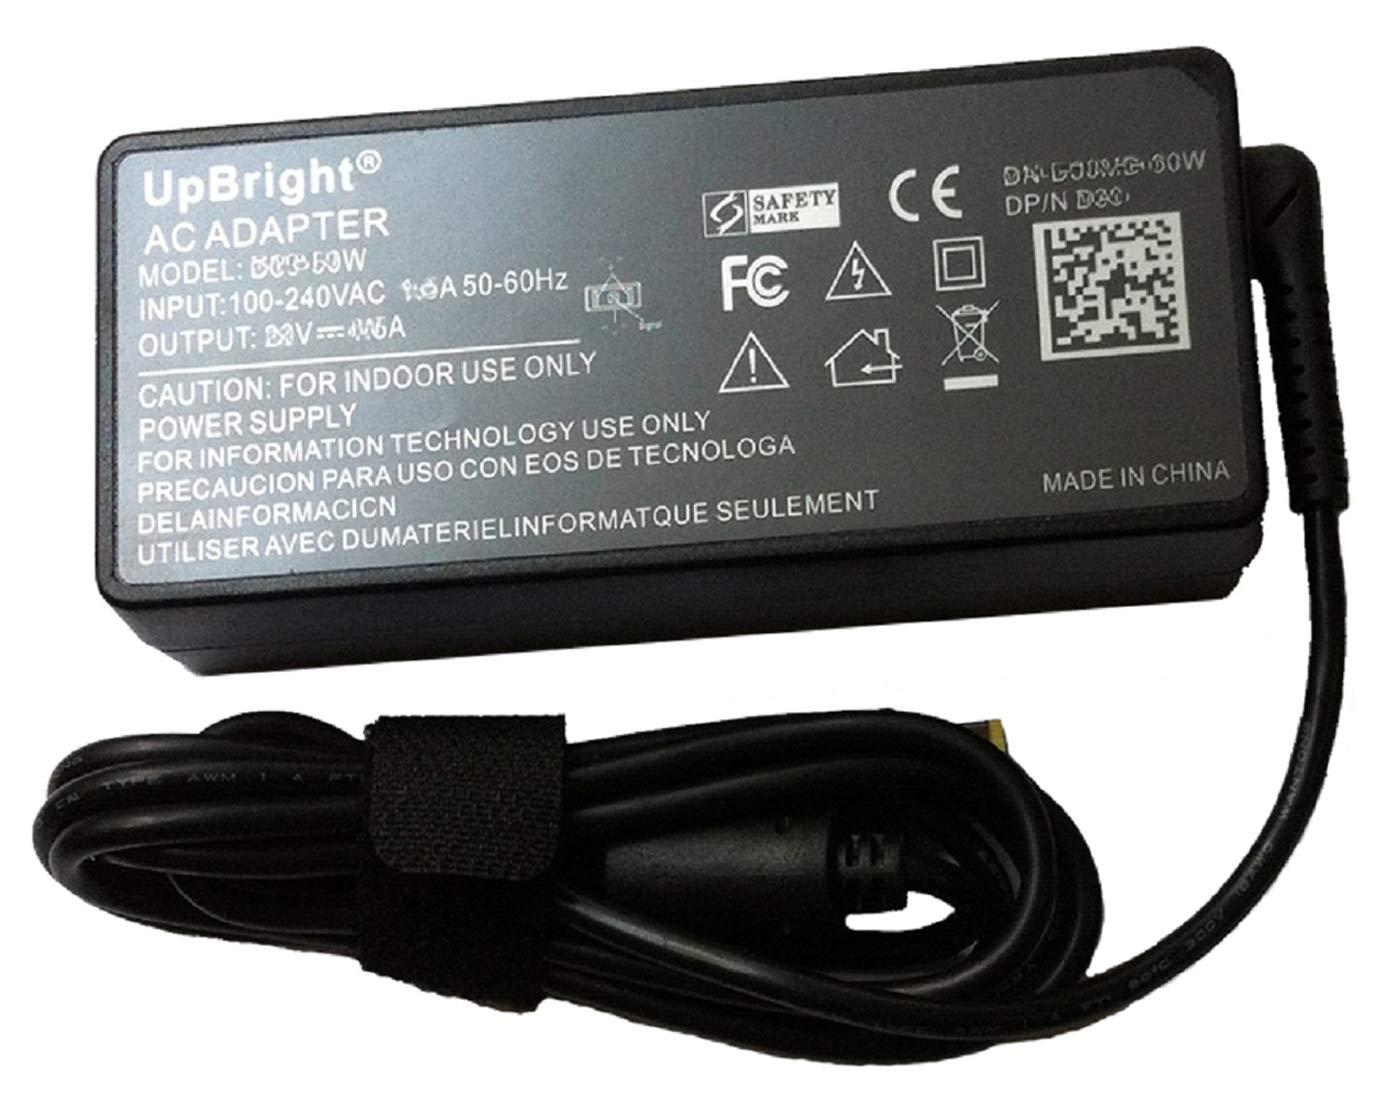 UpBright 20V AC/DC Adapter Replacement For Lenovo ThinkPad 11e Chrome & Windows Type 20D9 20DA 20DB 20DU S1 Yoga(20CDS00800) T440s 20AR001BUS ...